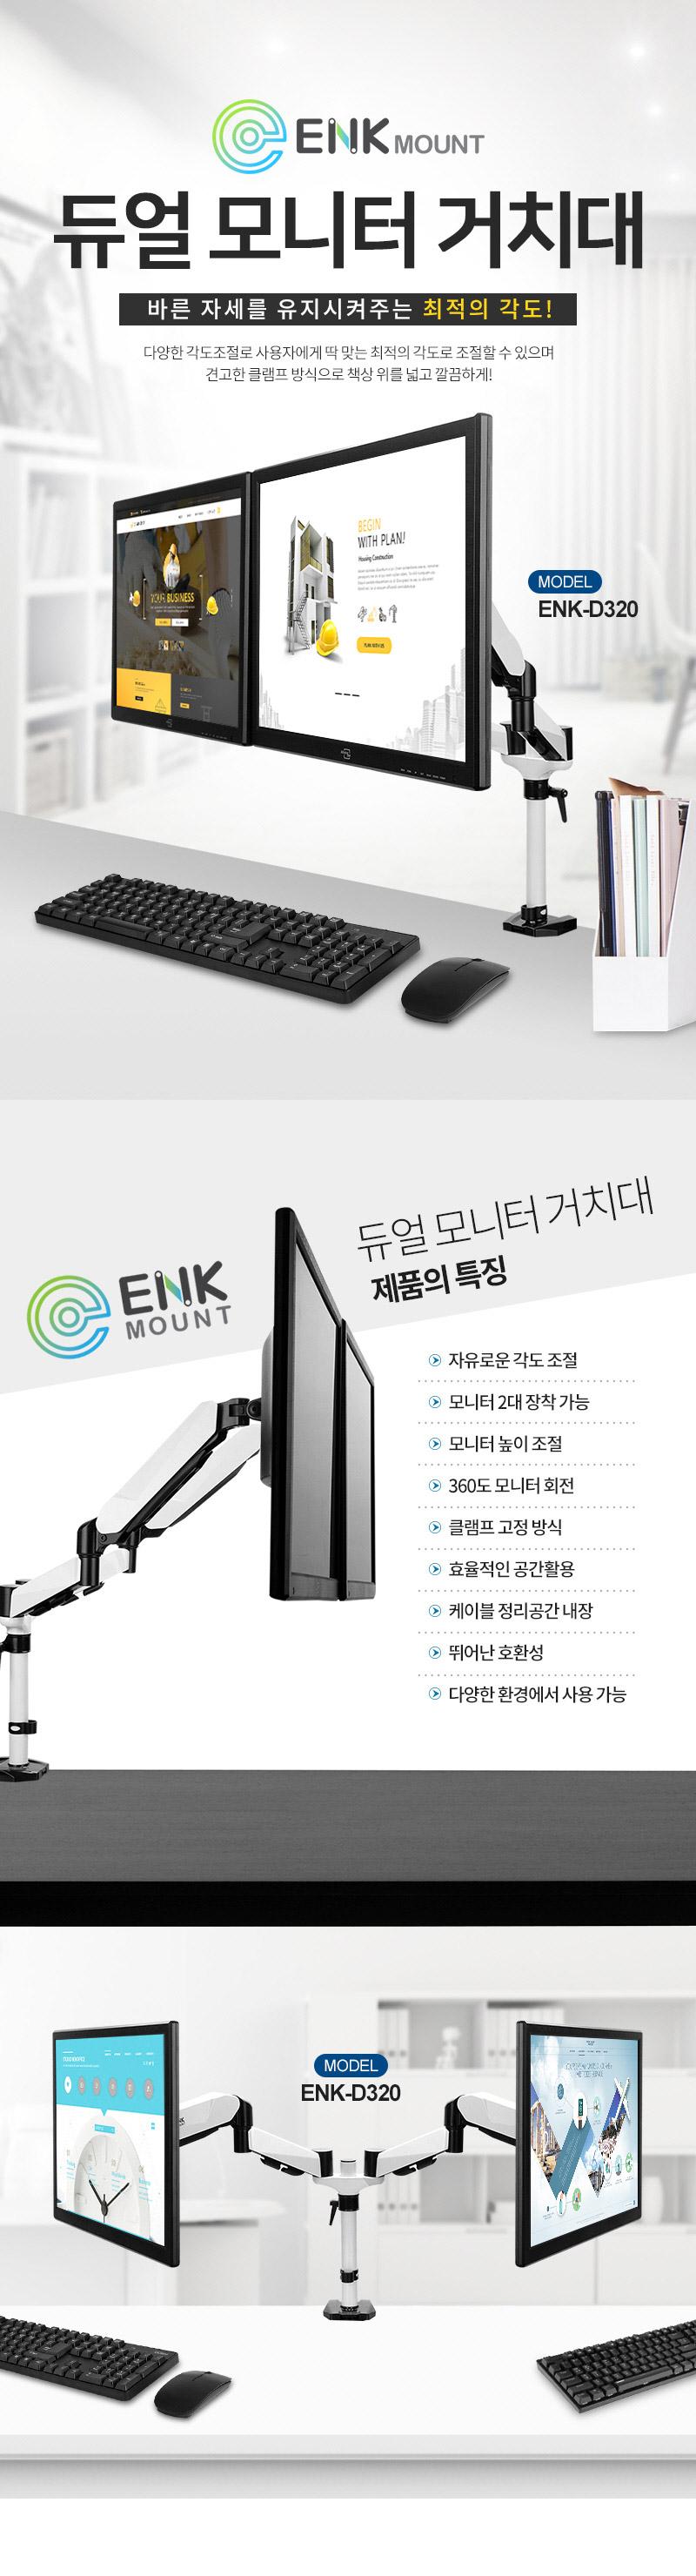 copy_ENK-D320_01.jpg